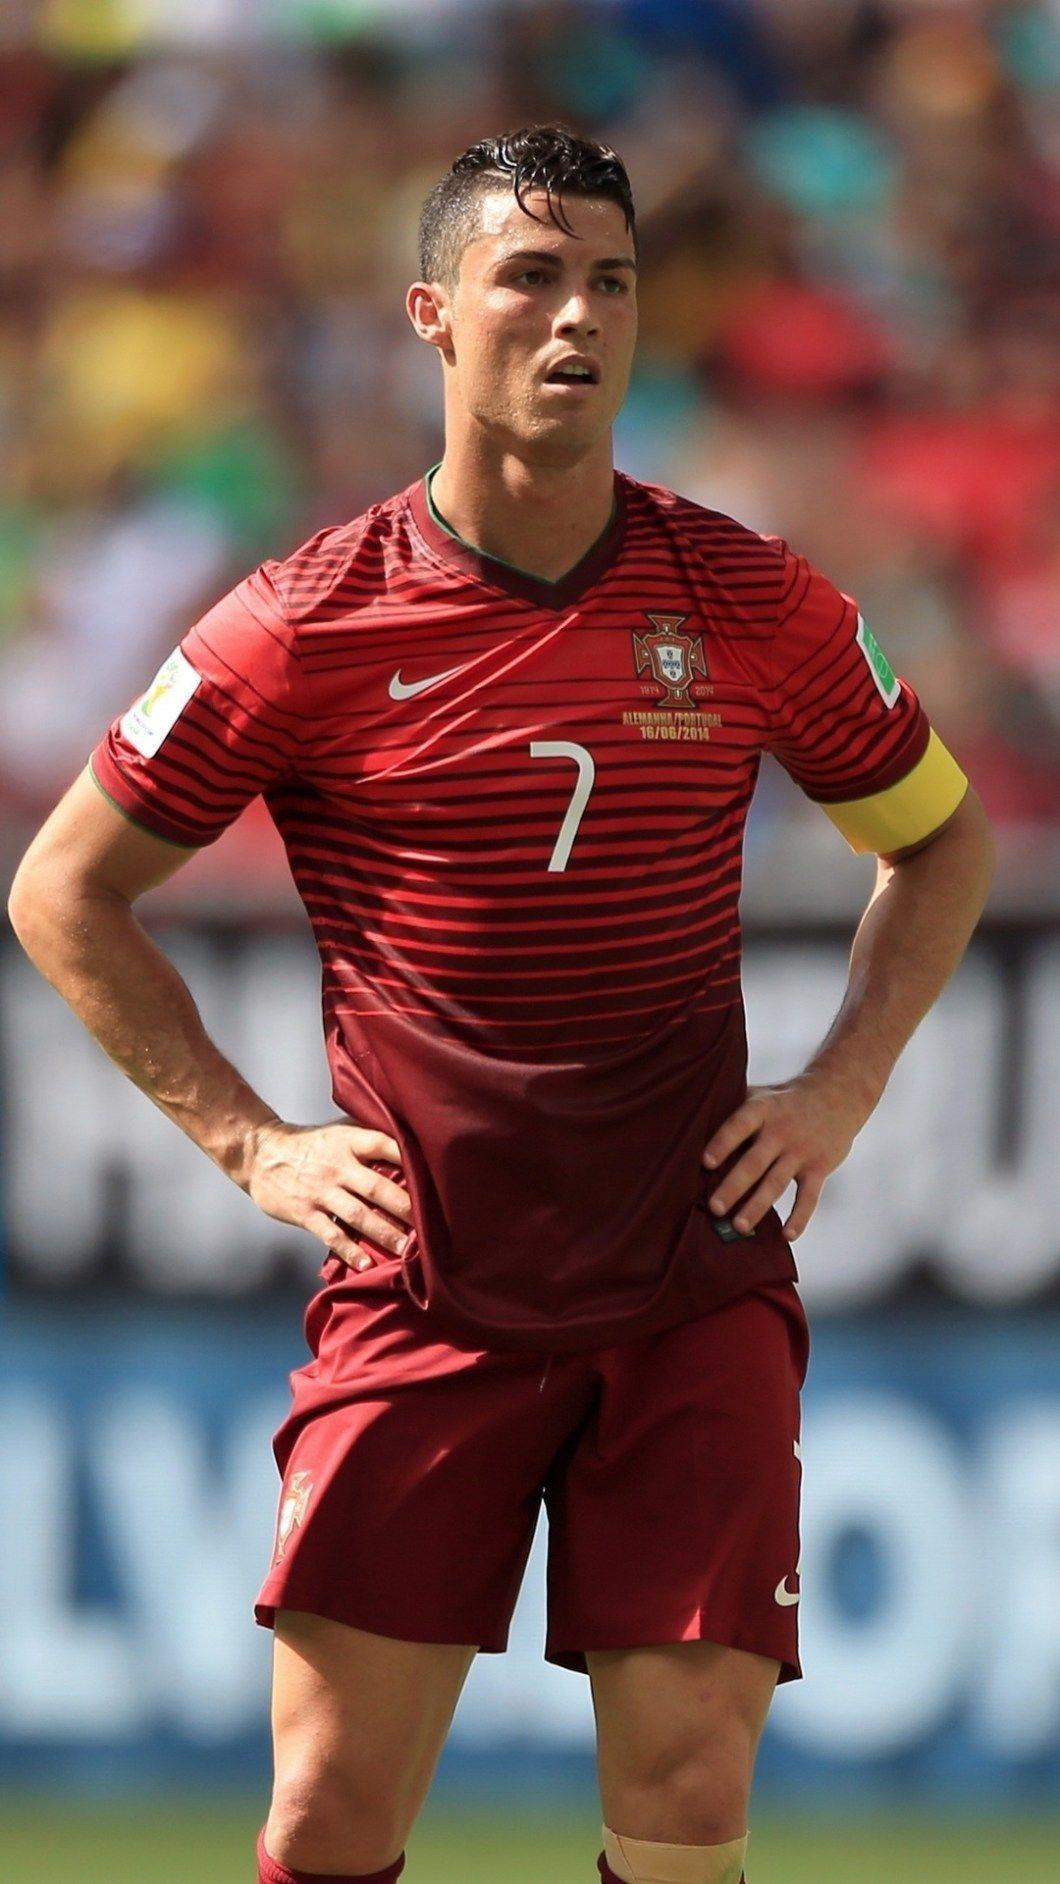 Cristiano Ronaldo 4k Wallpapers - Top Free Cristiano ...